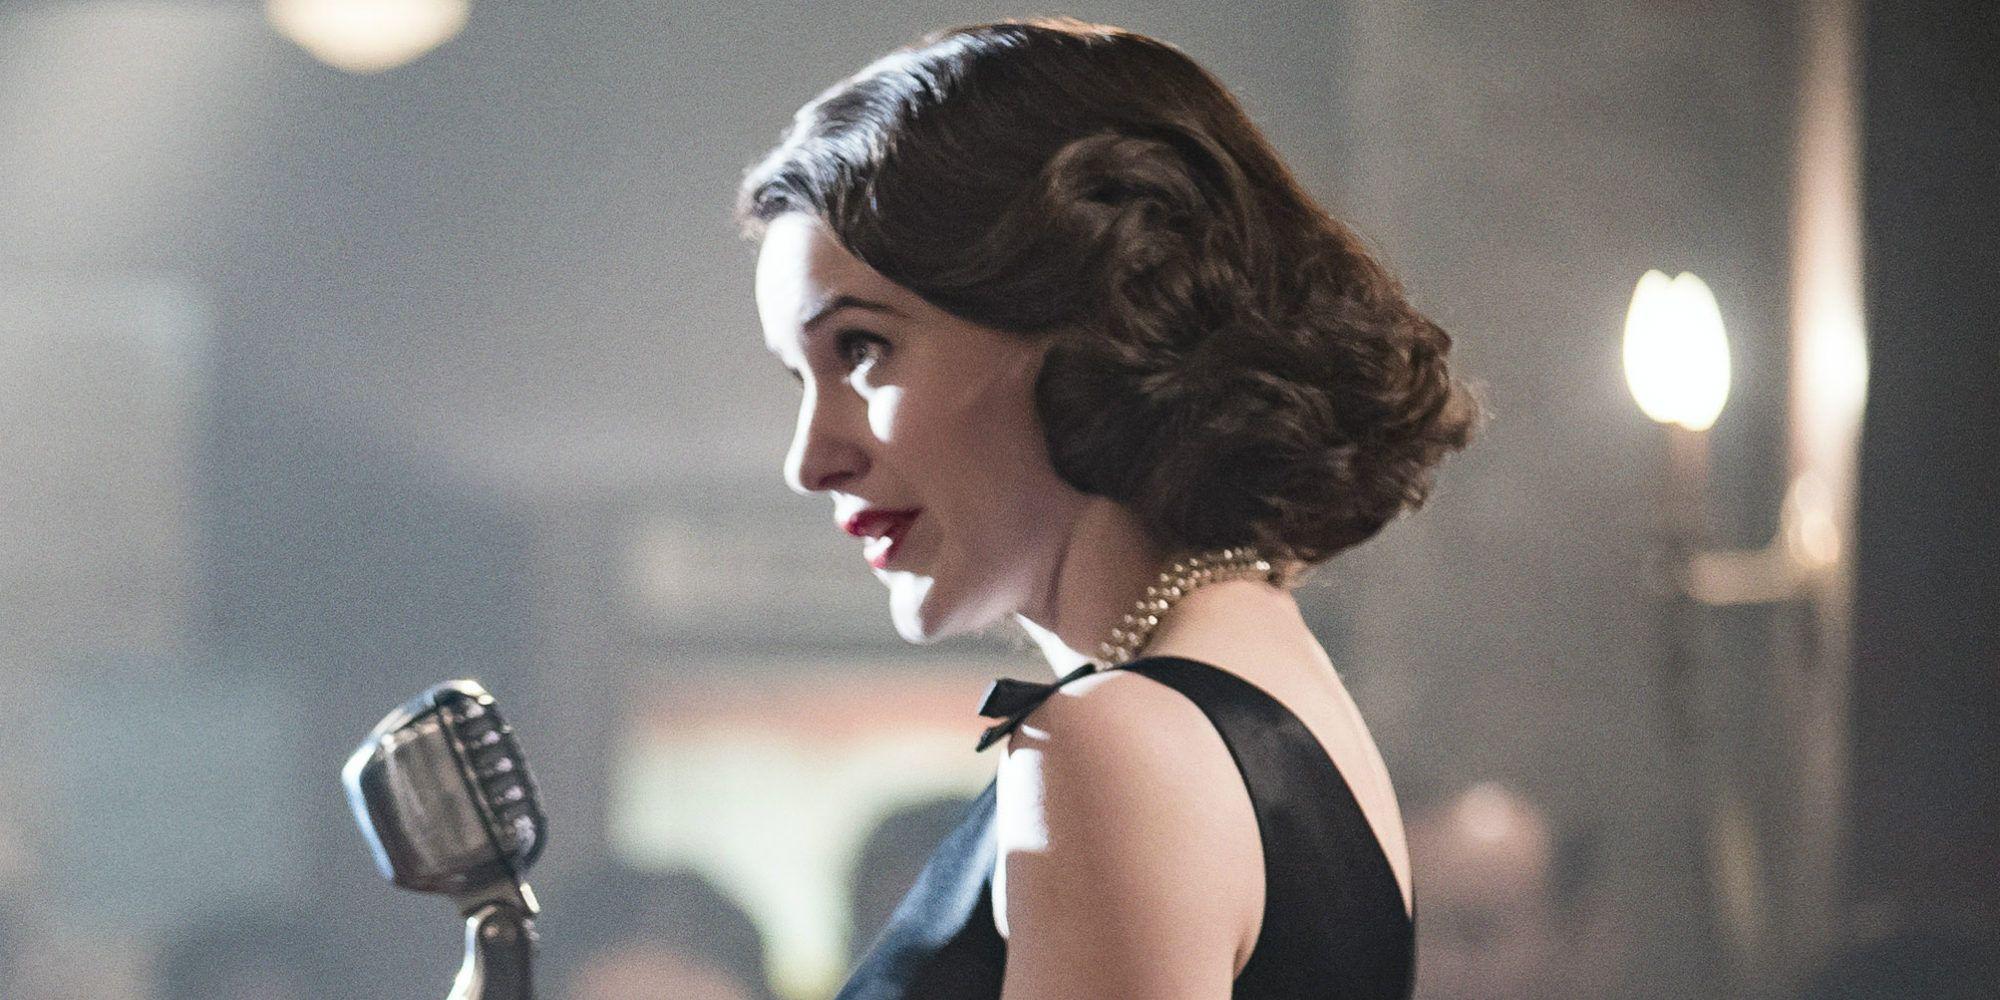 Marvelous Mrs. Maisel Season 2 Trailer Reveals December Premiere Date